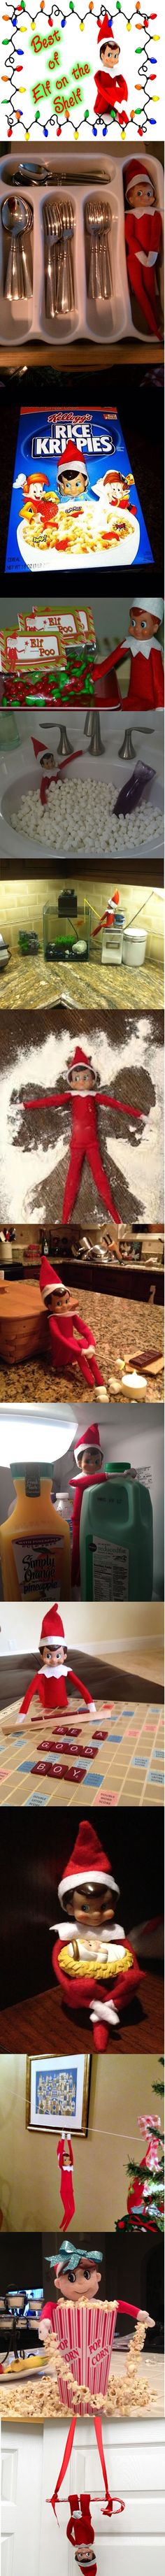 Best of Elf on the Shelf ;)